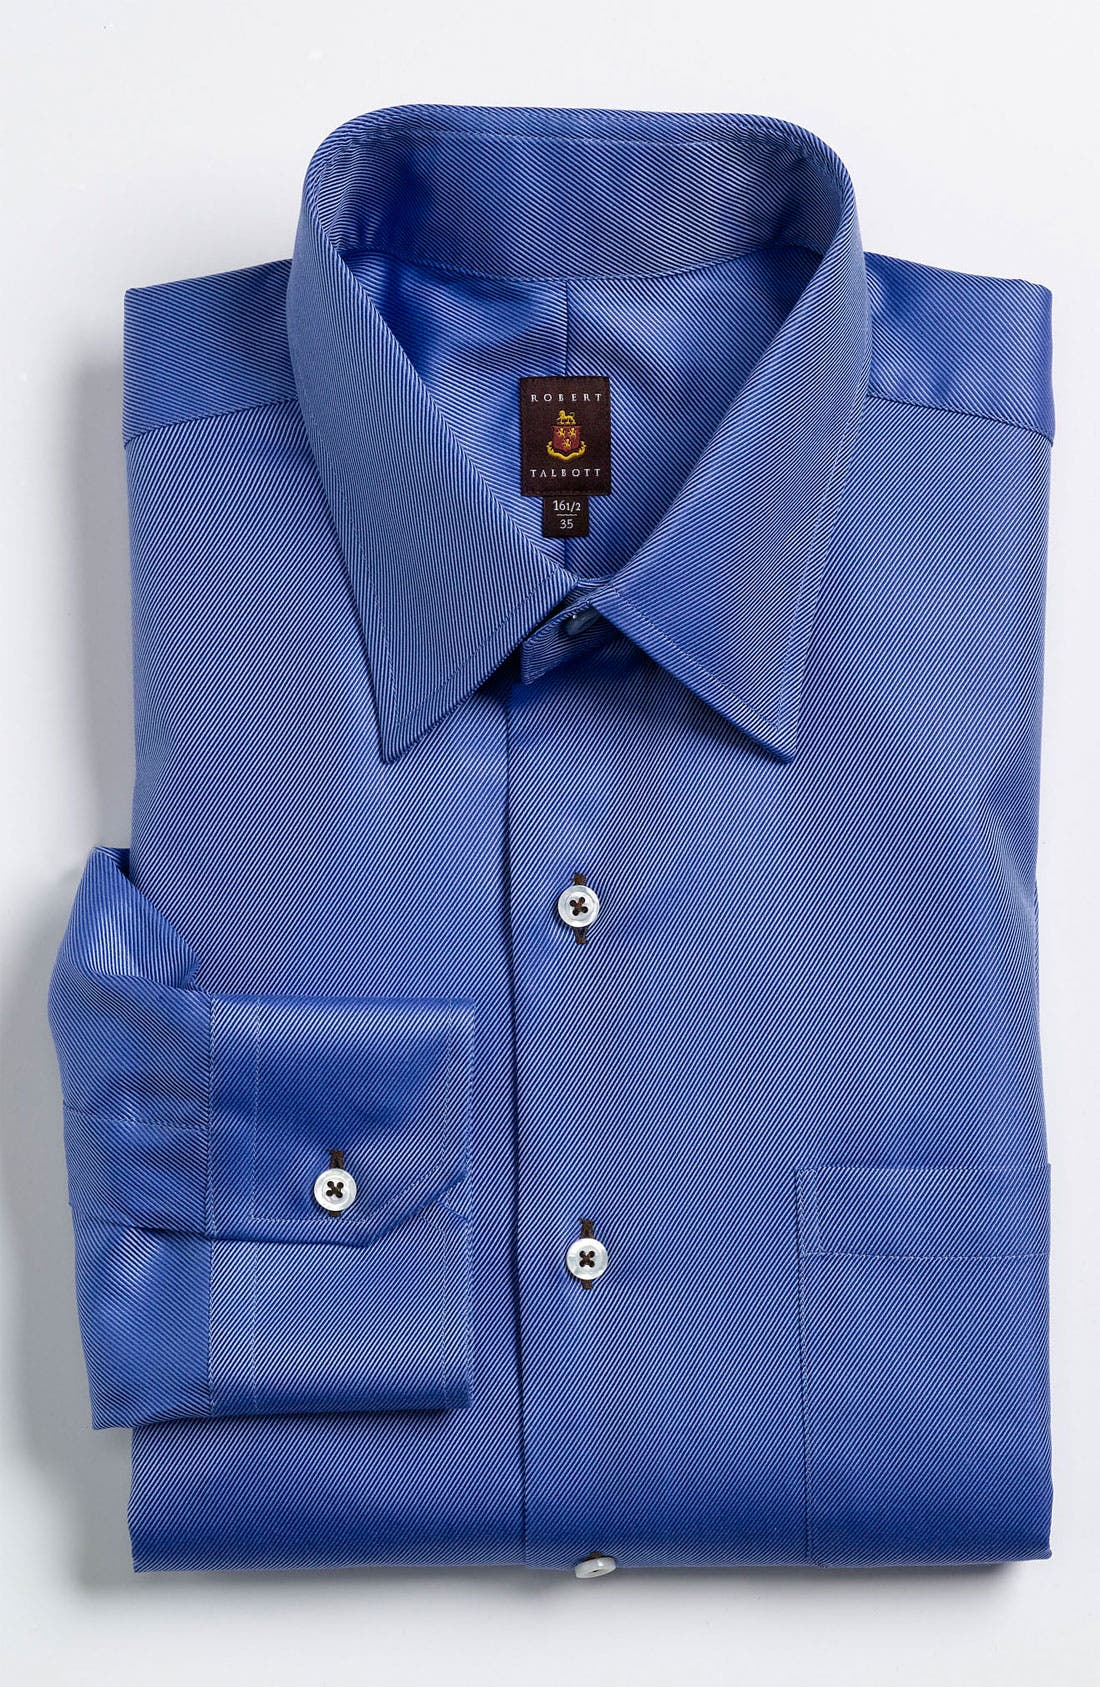 Alternate Image 1 Selected - Robert Talbott Classic Fit Dress Shirt (Online Only)